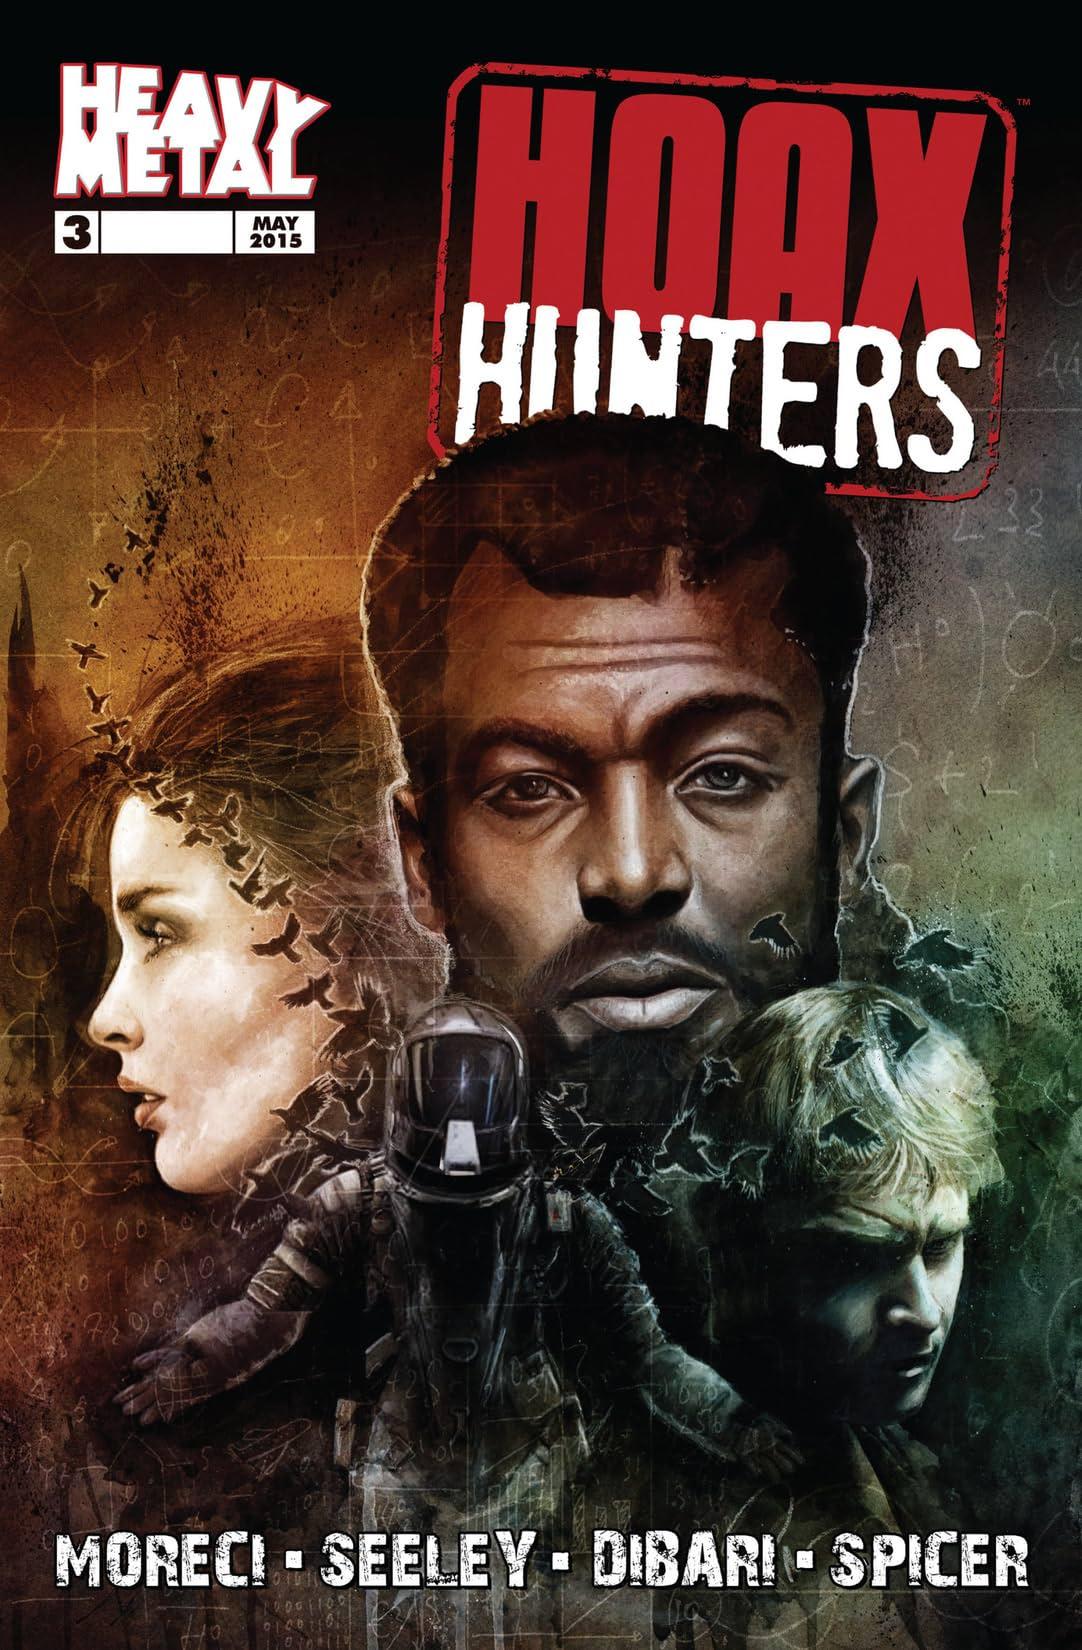 Hoax Hunters #3